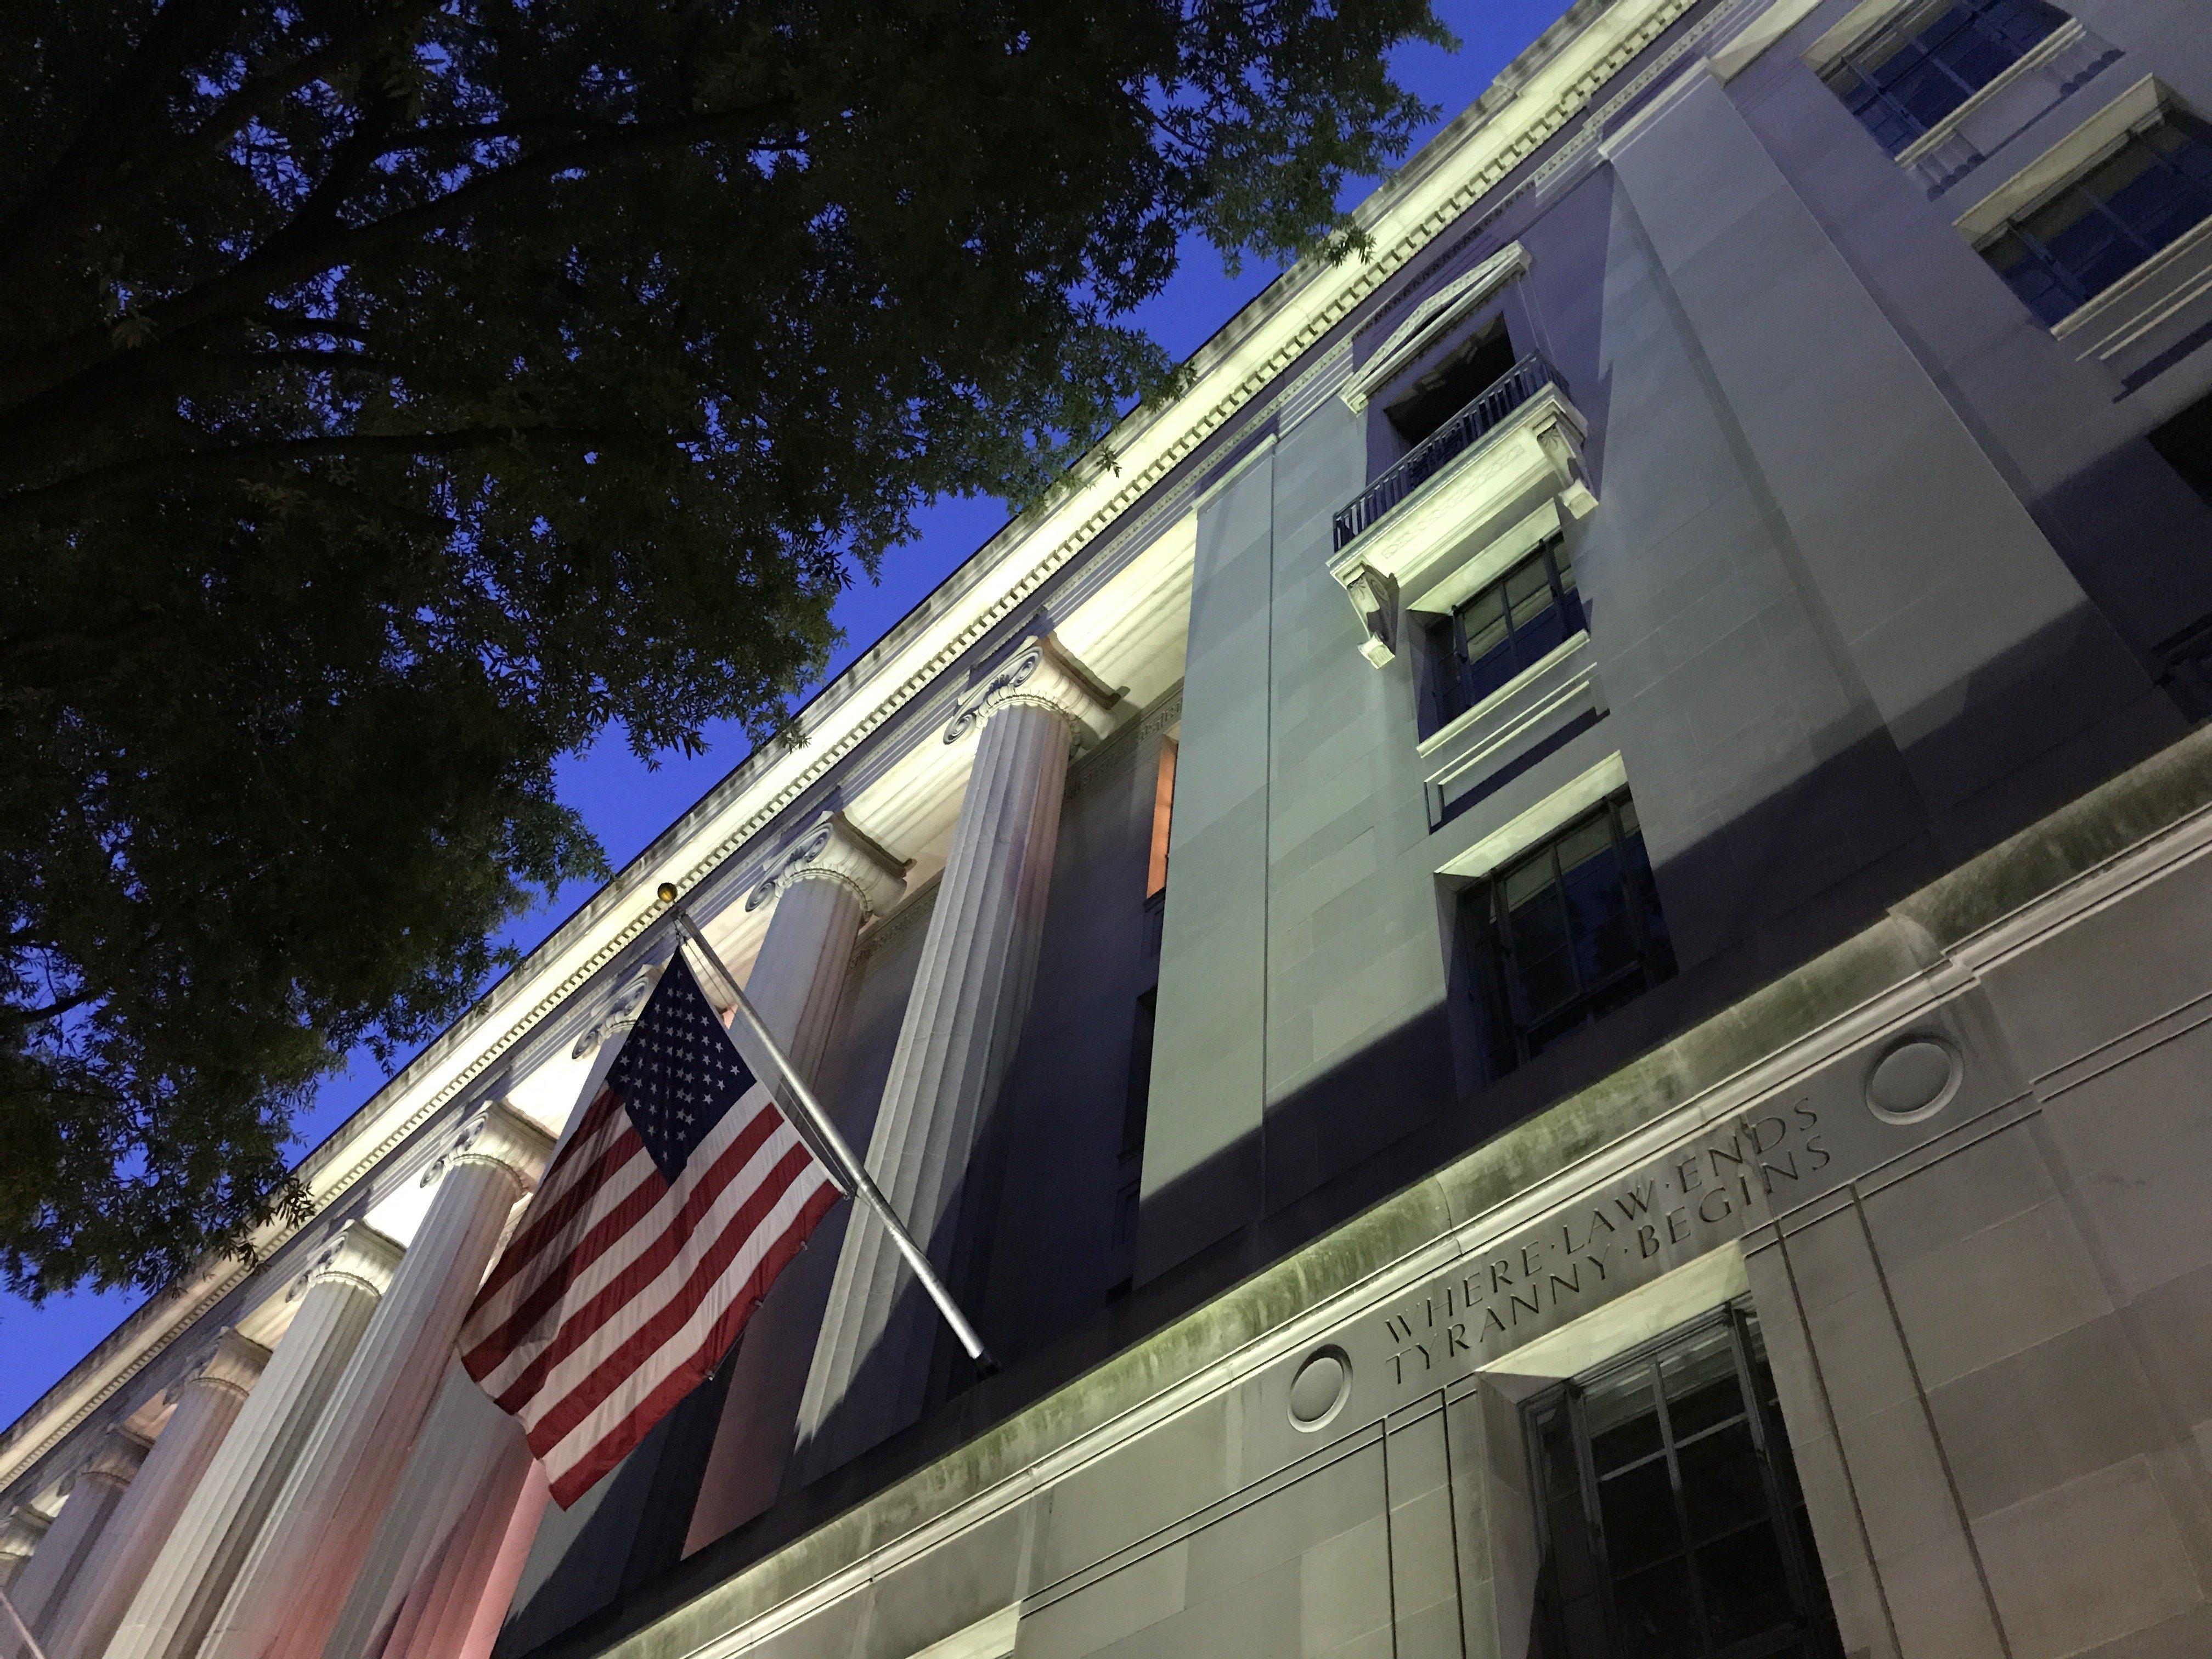 Department of Justice headquarters in Washington, D.C.